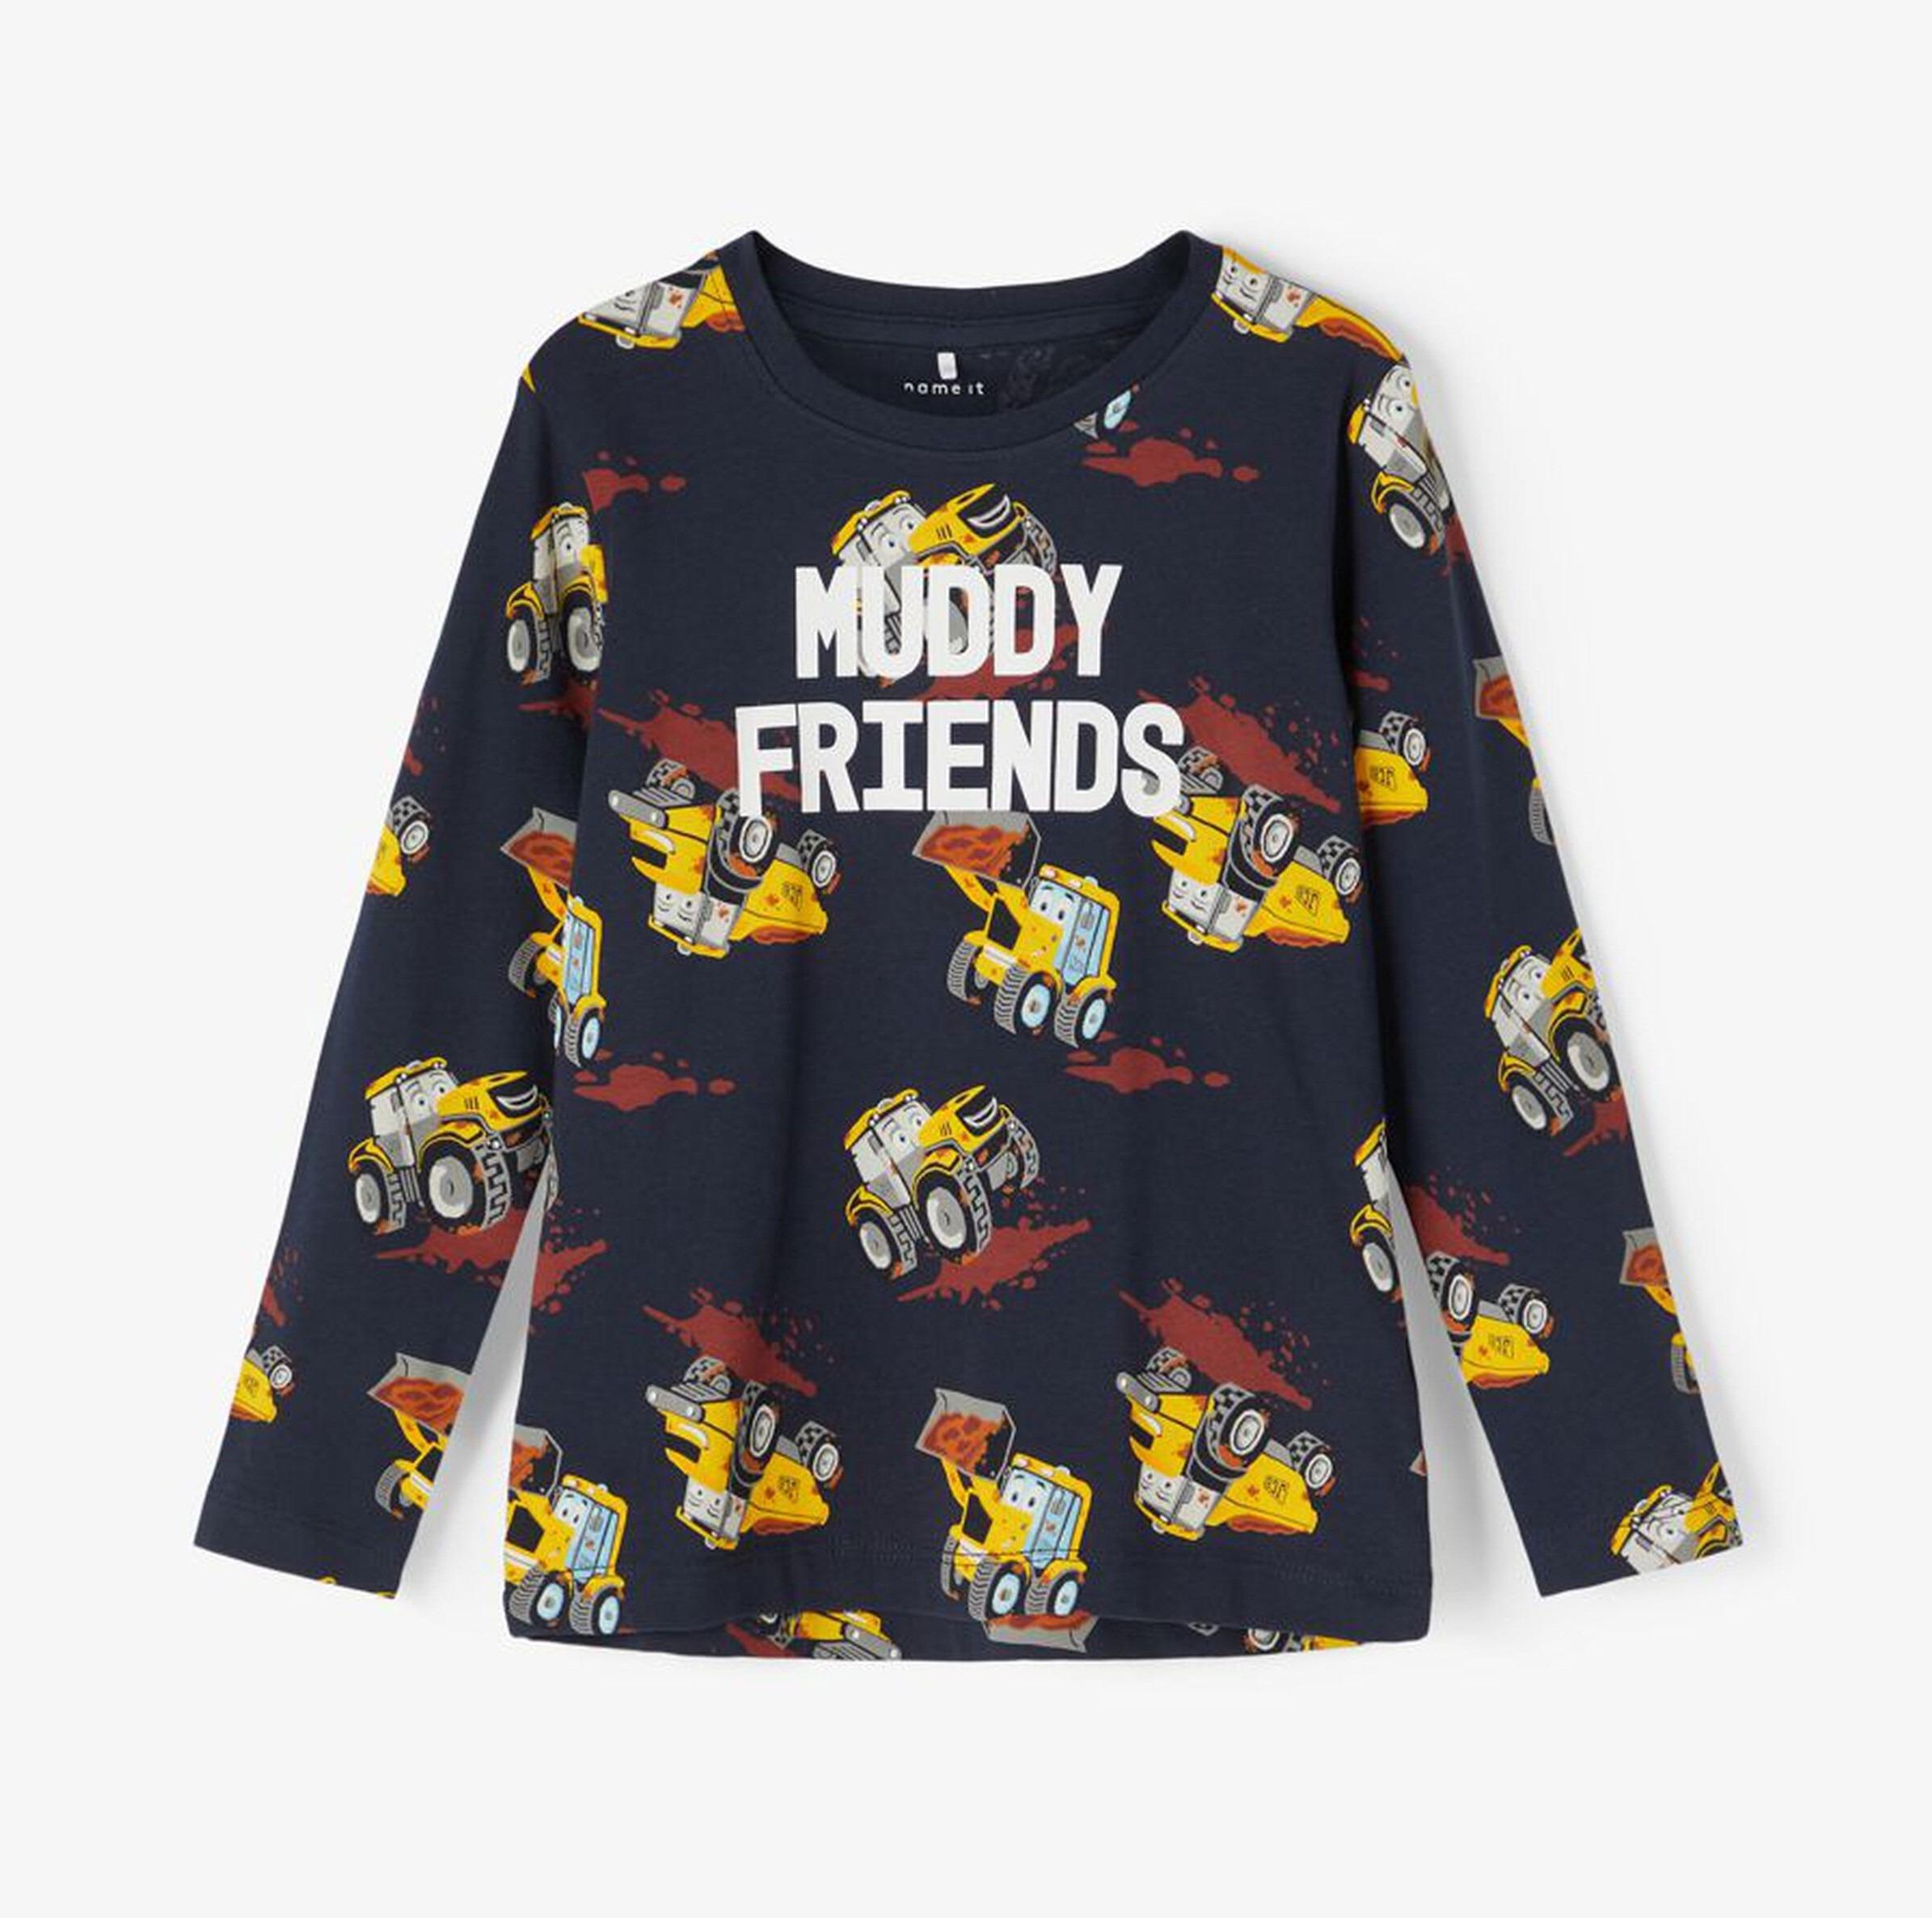 JCB Muddy Friends Long Sleeve T-shirt Navy